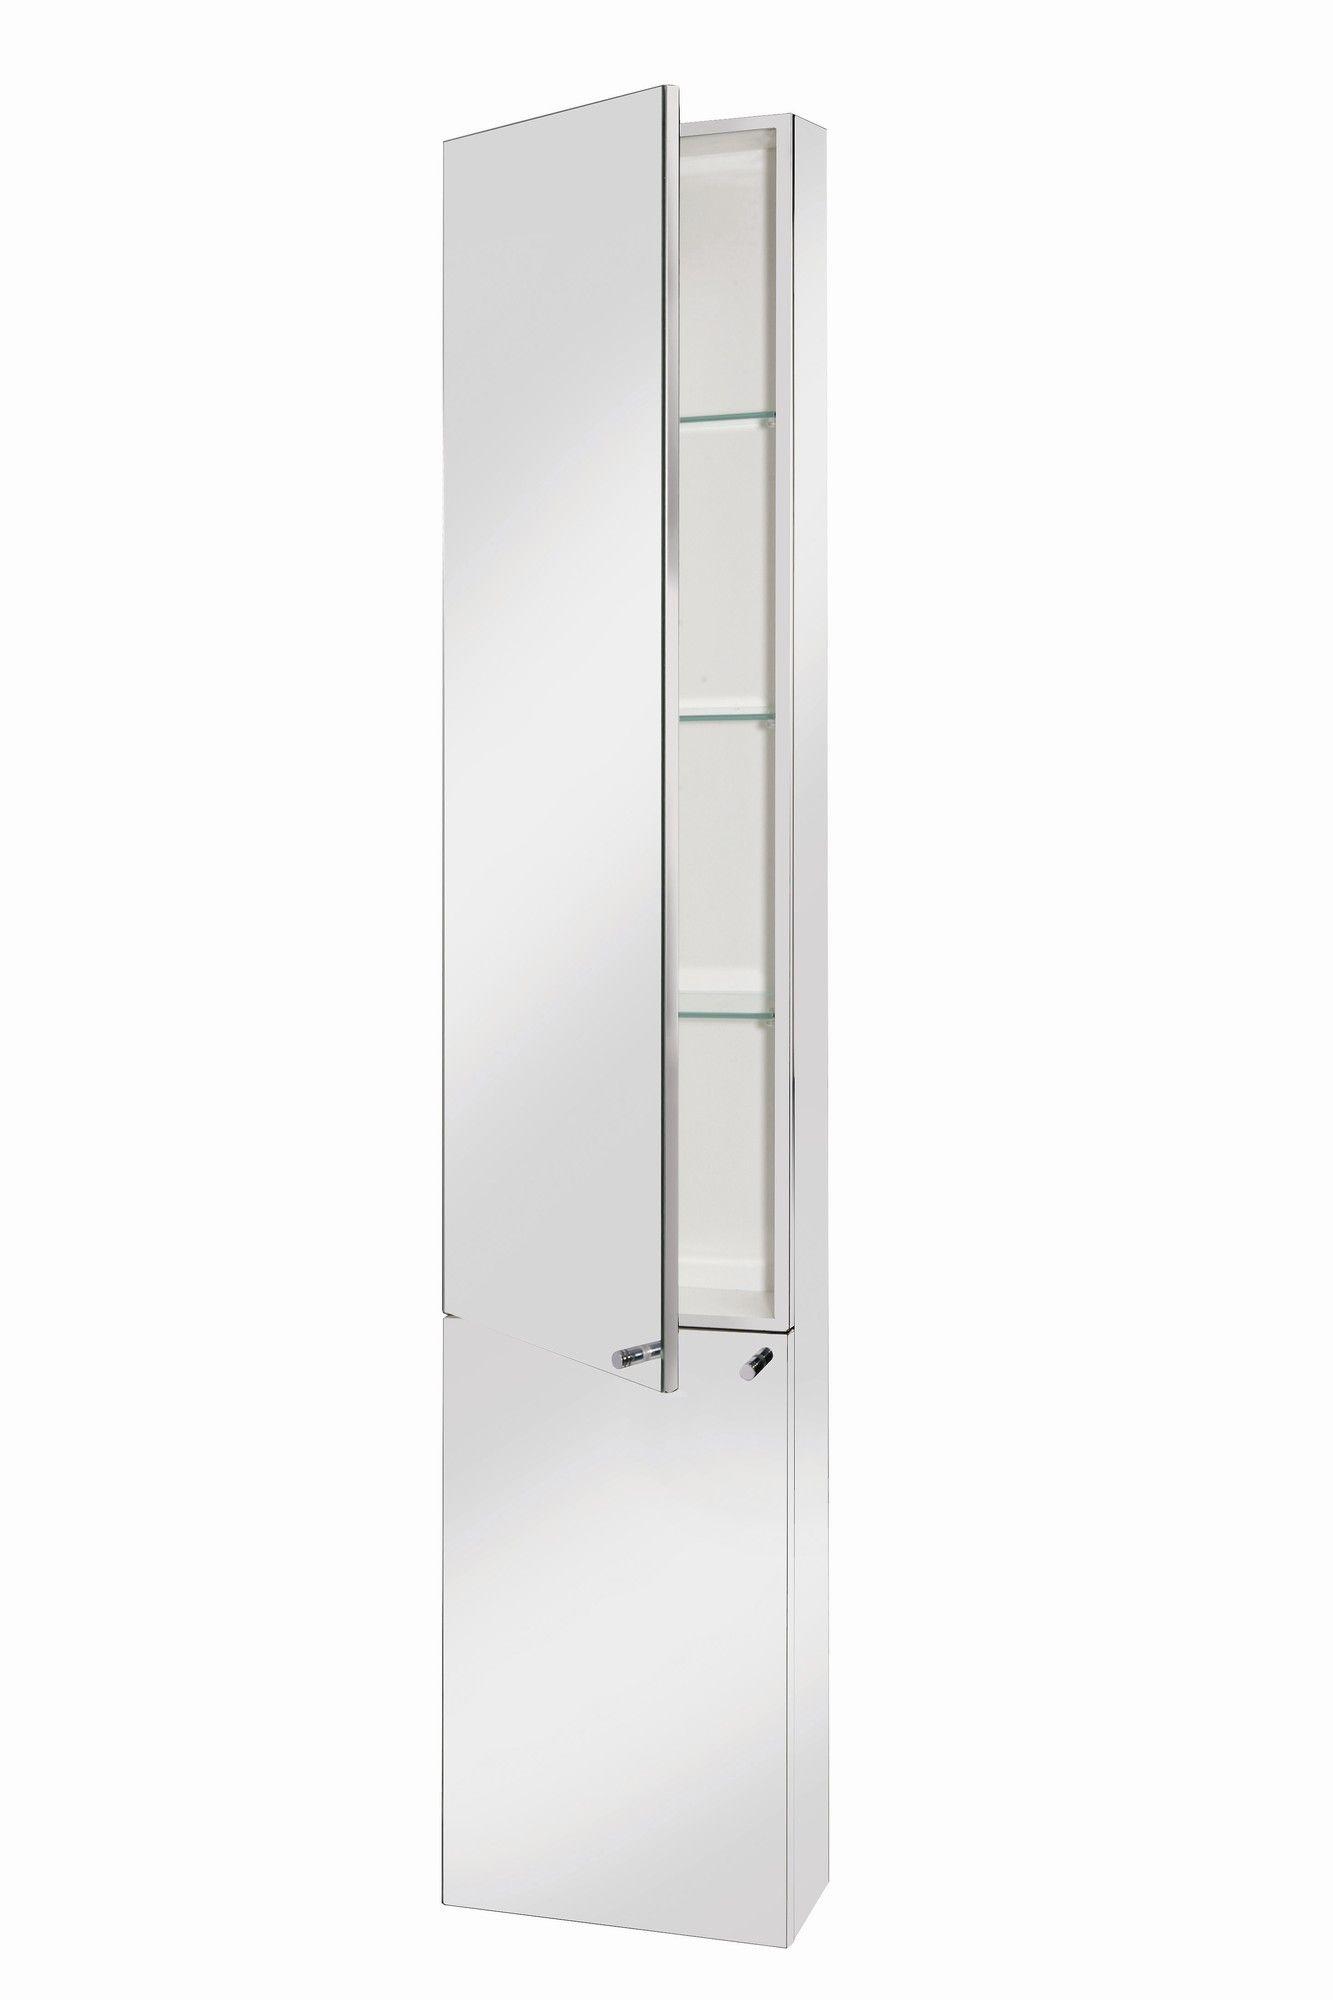 Croydex Nile Tall Mirrored Medicine Cabinet 209 48 Extra Tall Medicine Cabinet Cabinet